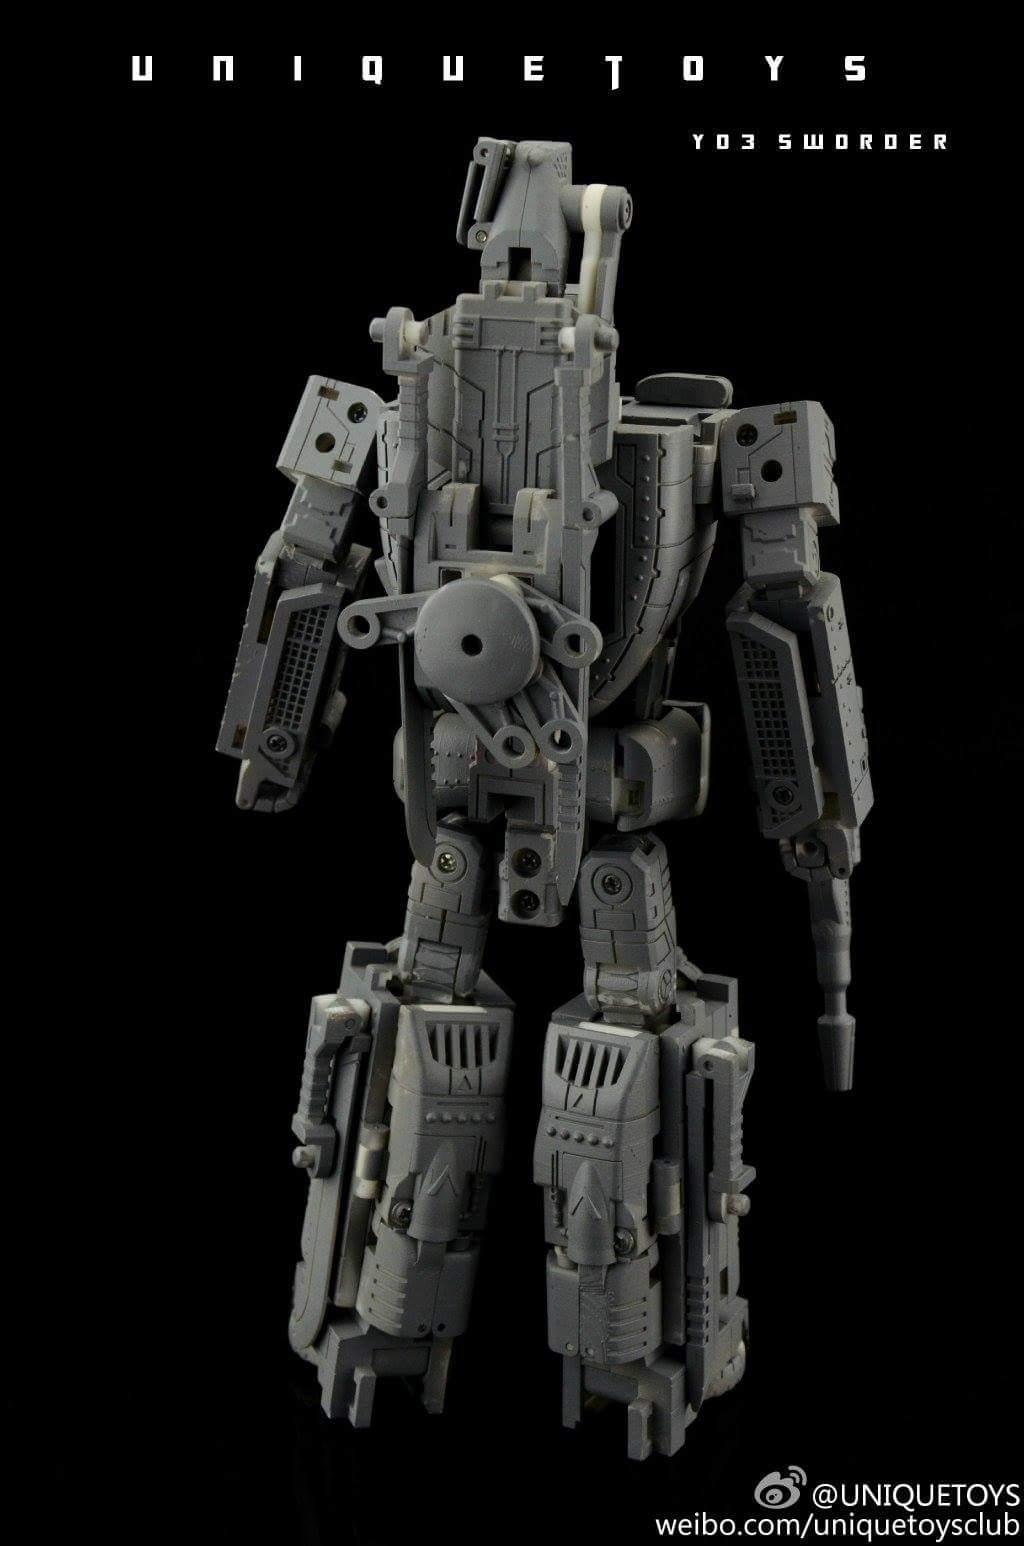 [Unique Toys] Produit Tiers - Jouet Y-03 Sworder - aka Sandstorm/Siroco FbTeL6NL